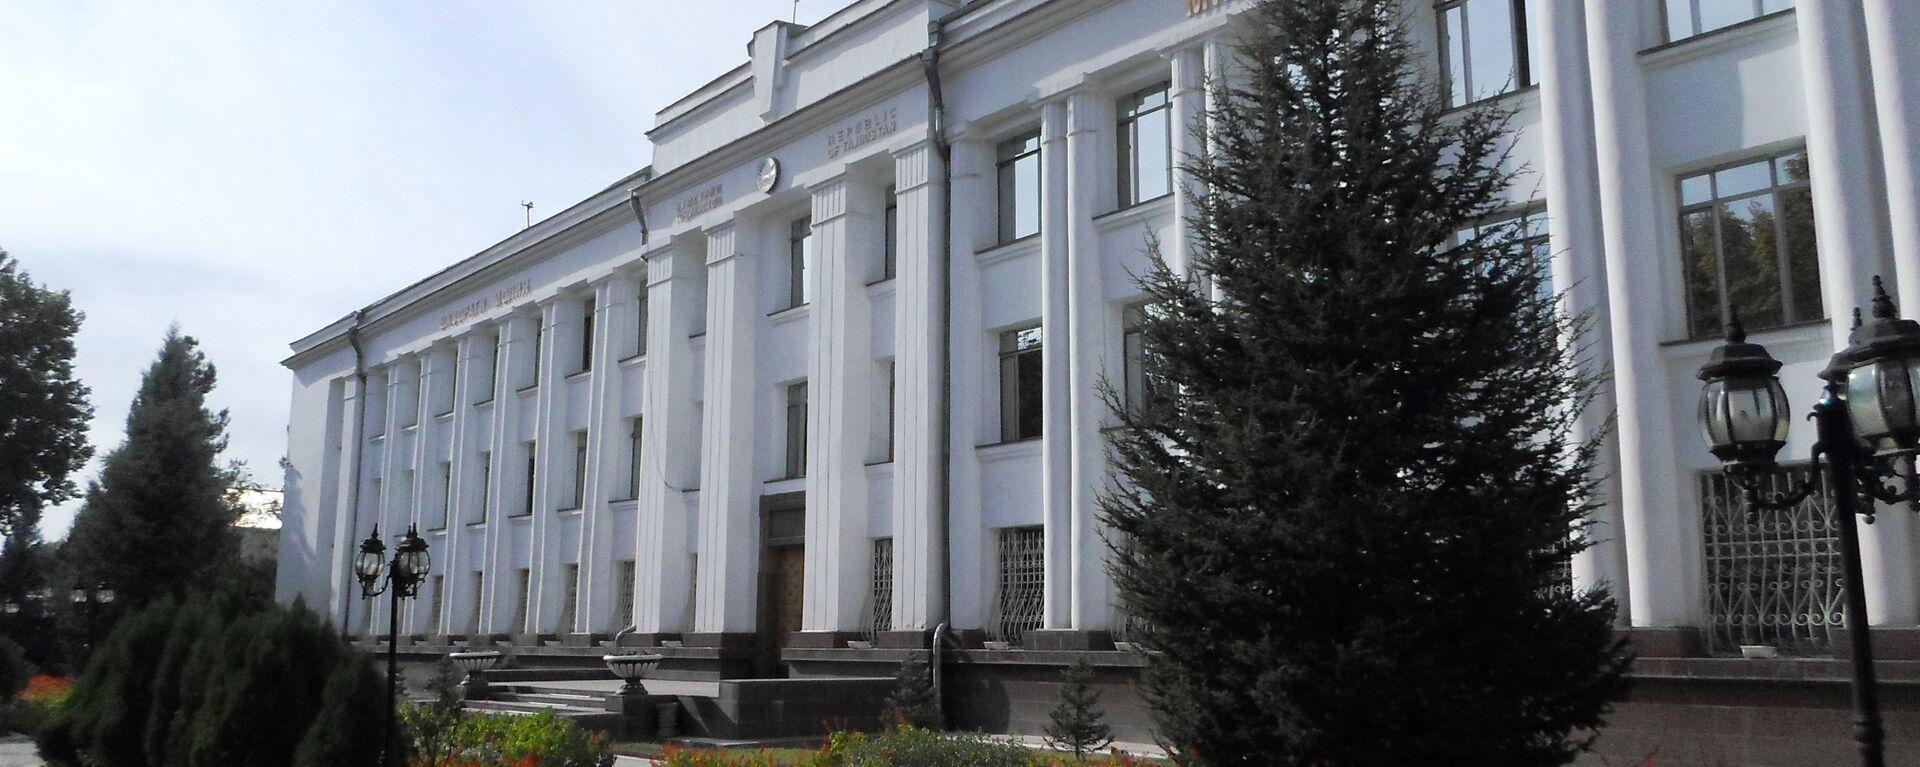 Министерство финансов РТ. Архивное фото - Sputnik Таджикистан, 1920, 11.01.2021